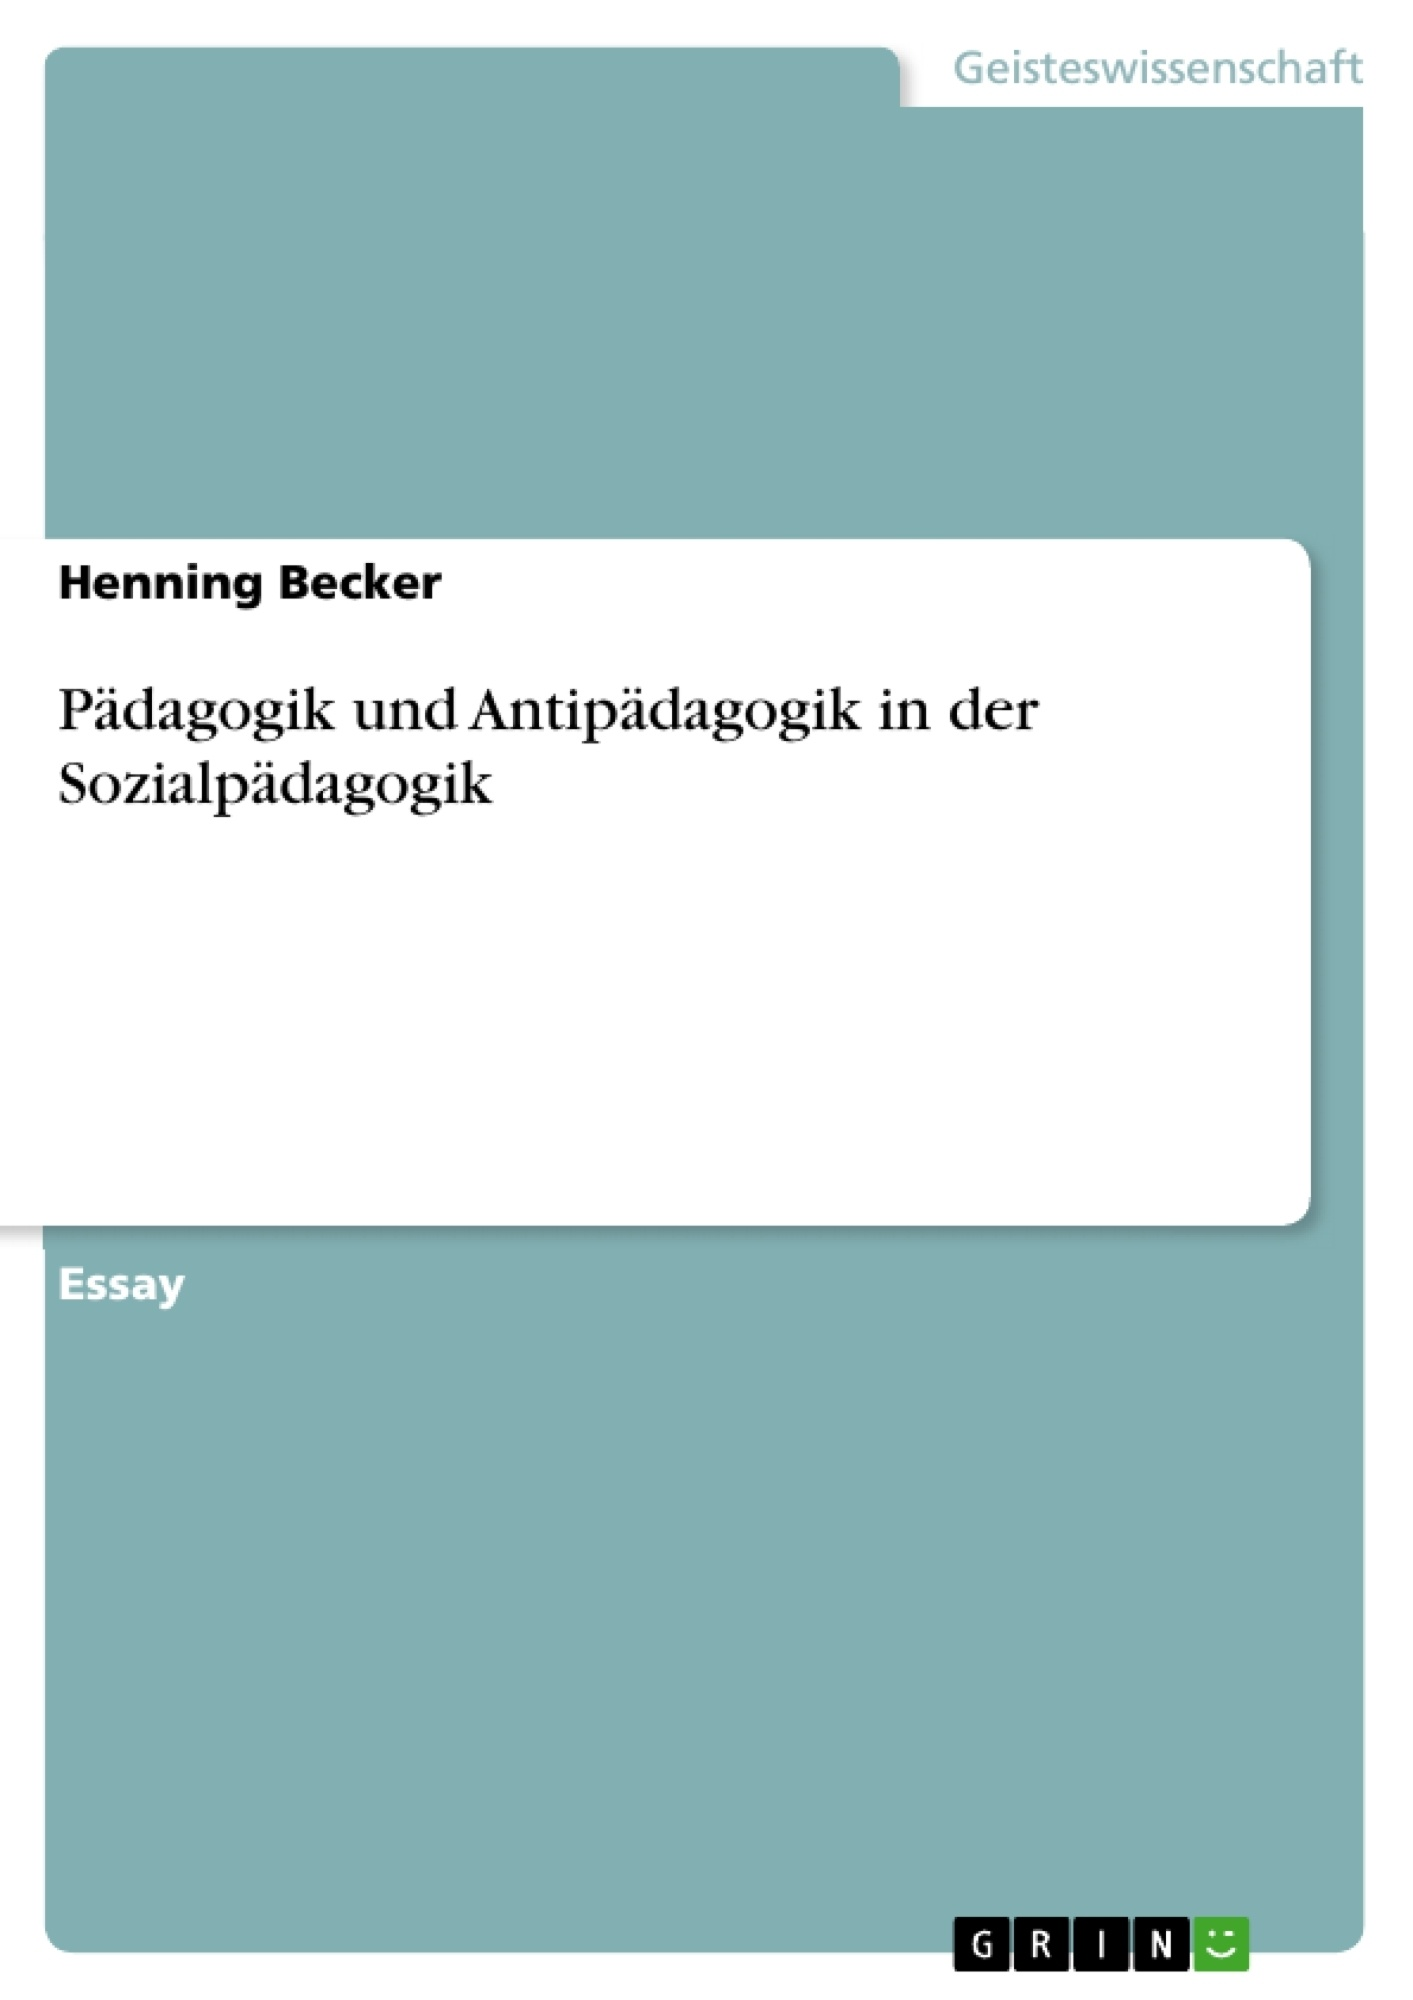 Titel: Pädagogik und Antipädagogik in der Sozialpädagogik